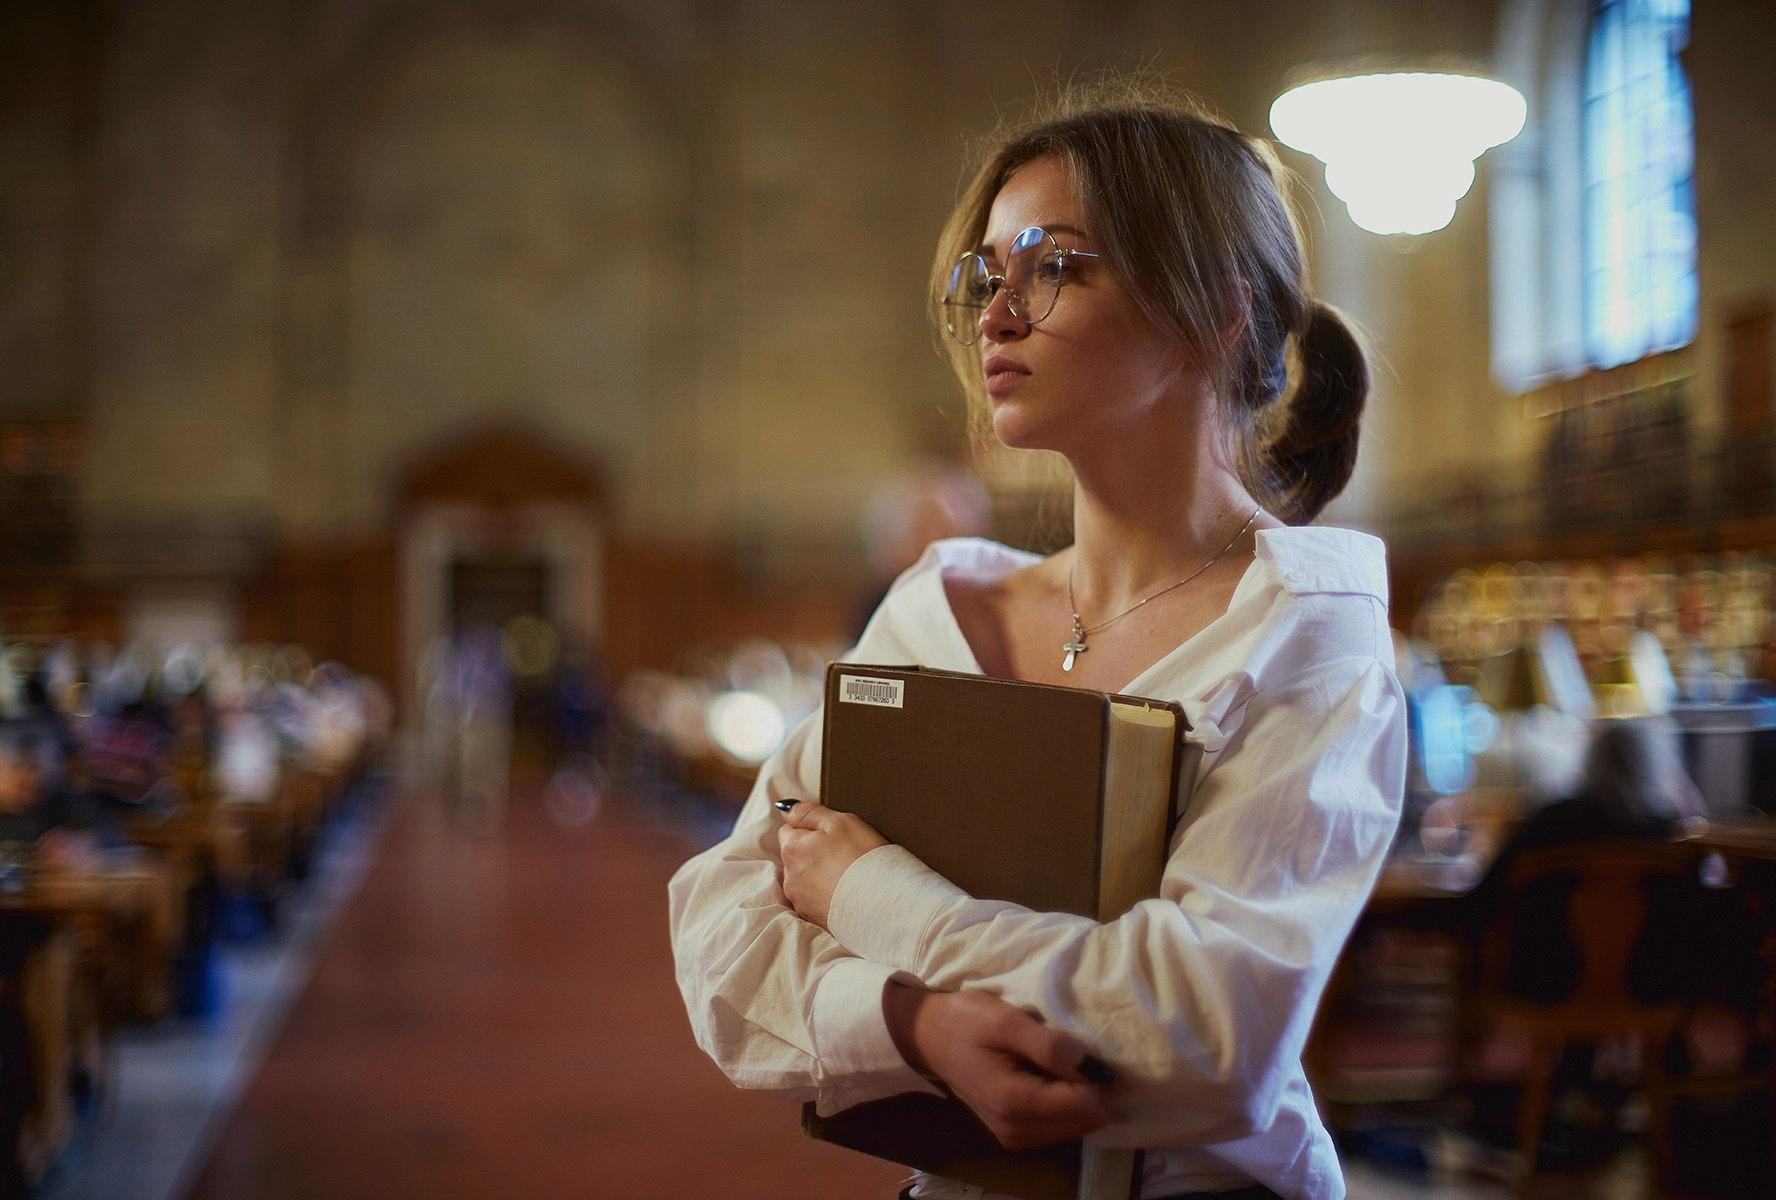 People 1776x1200 women brunette ponytail white shirt women with glasses no bra standing library books bokeh face Alexey Pedan Anna Vorobyeva